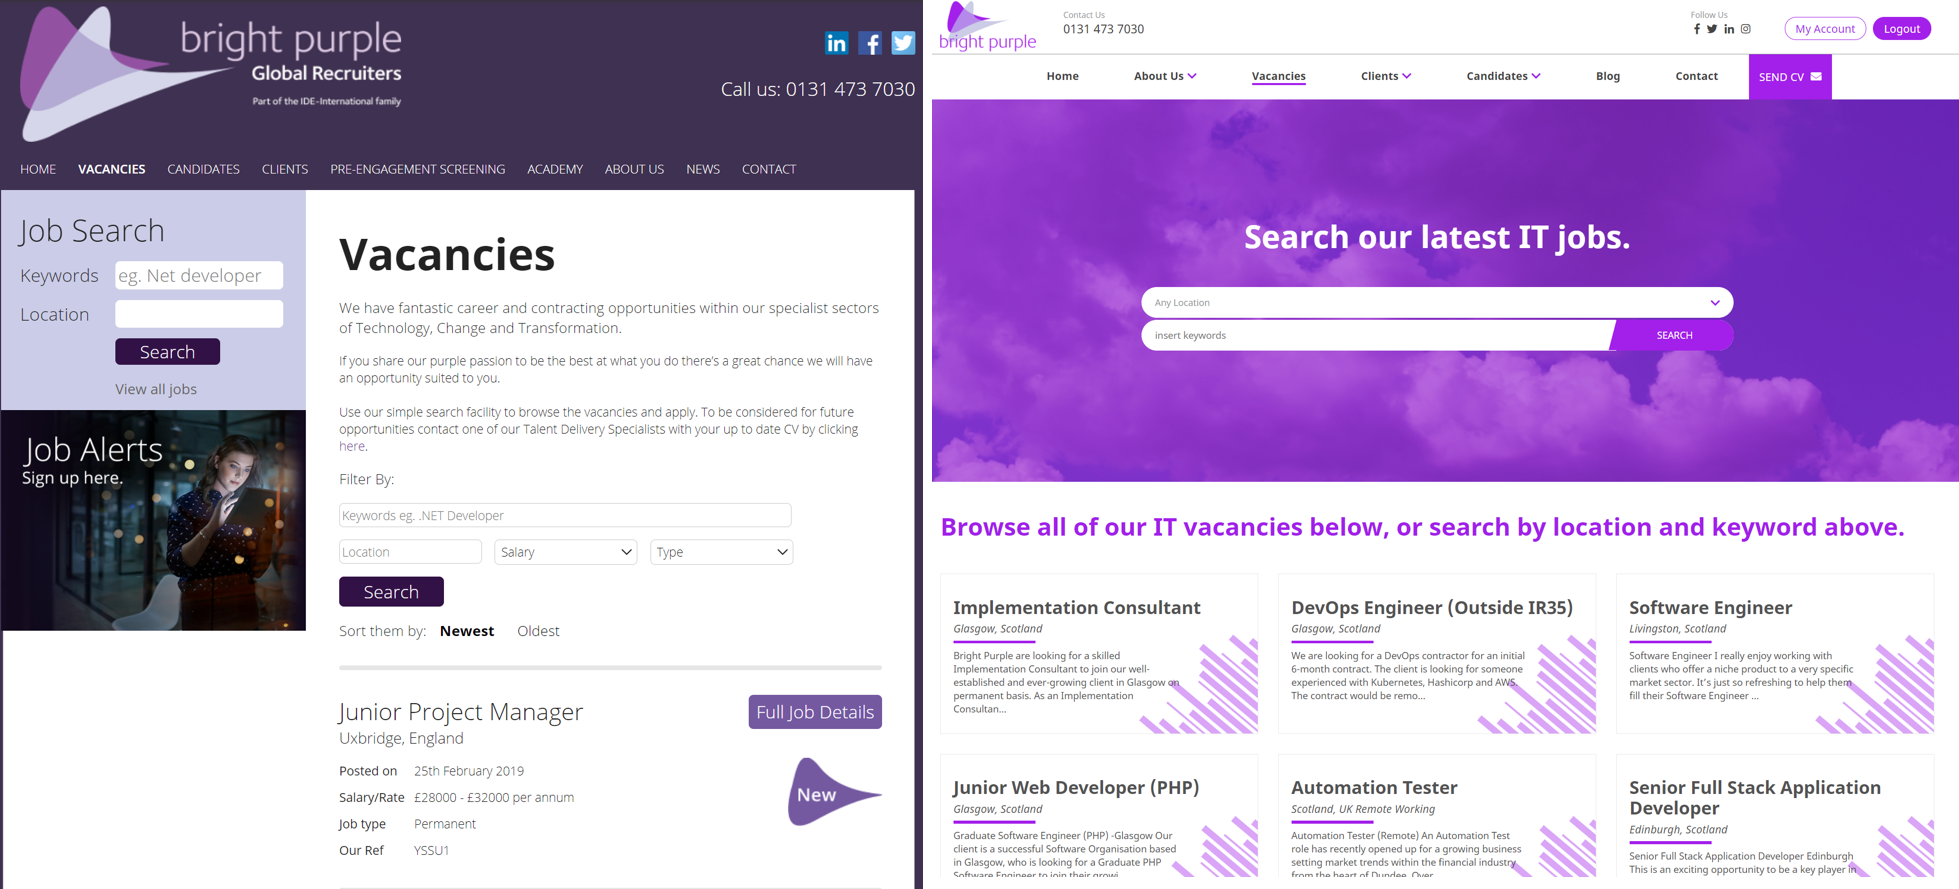 Old website vs new website